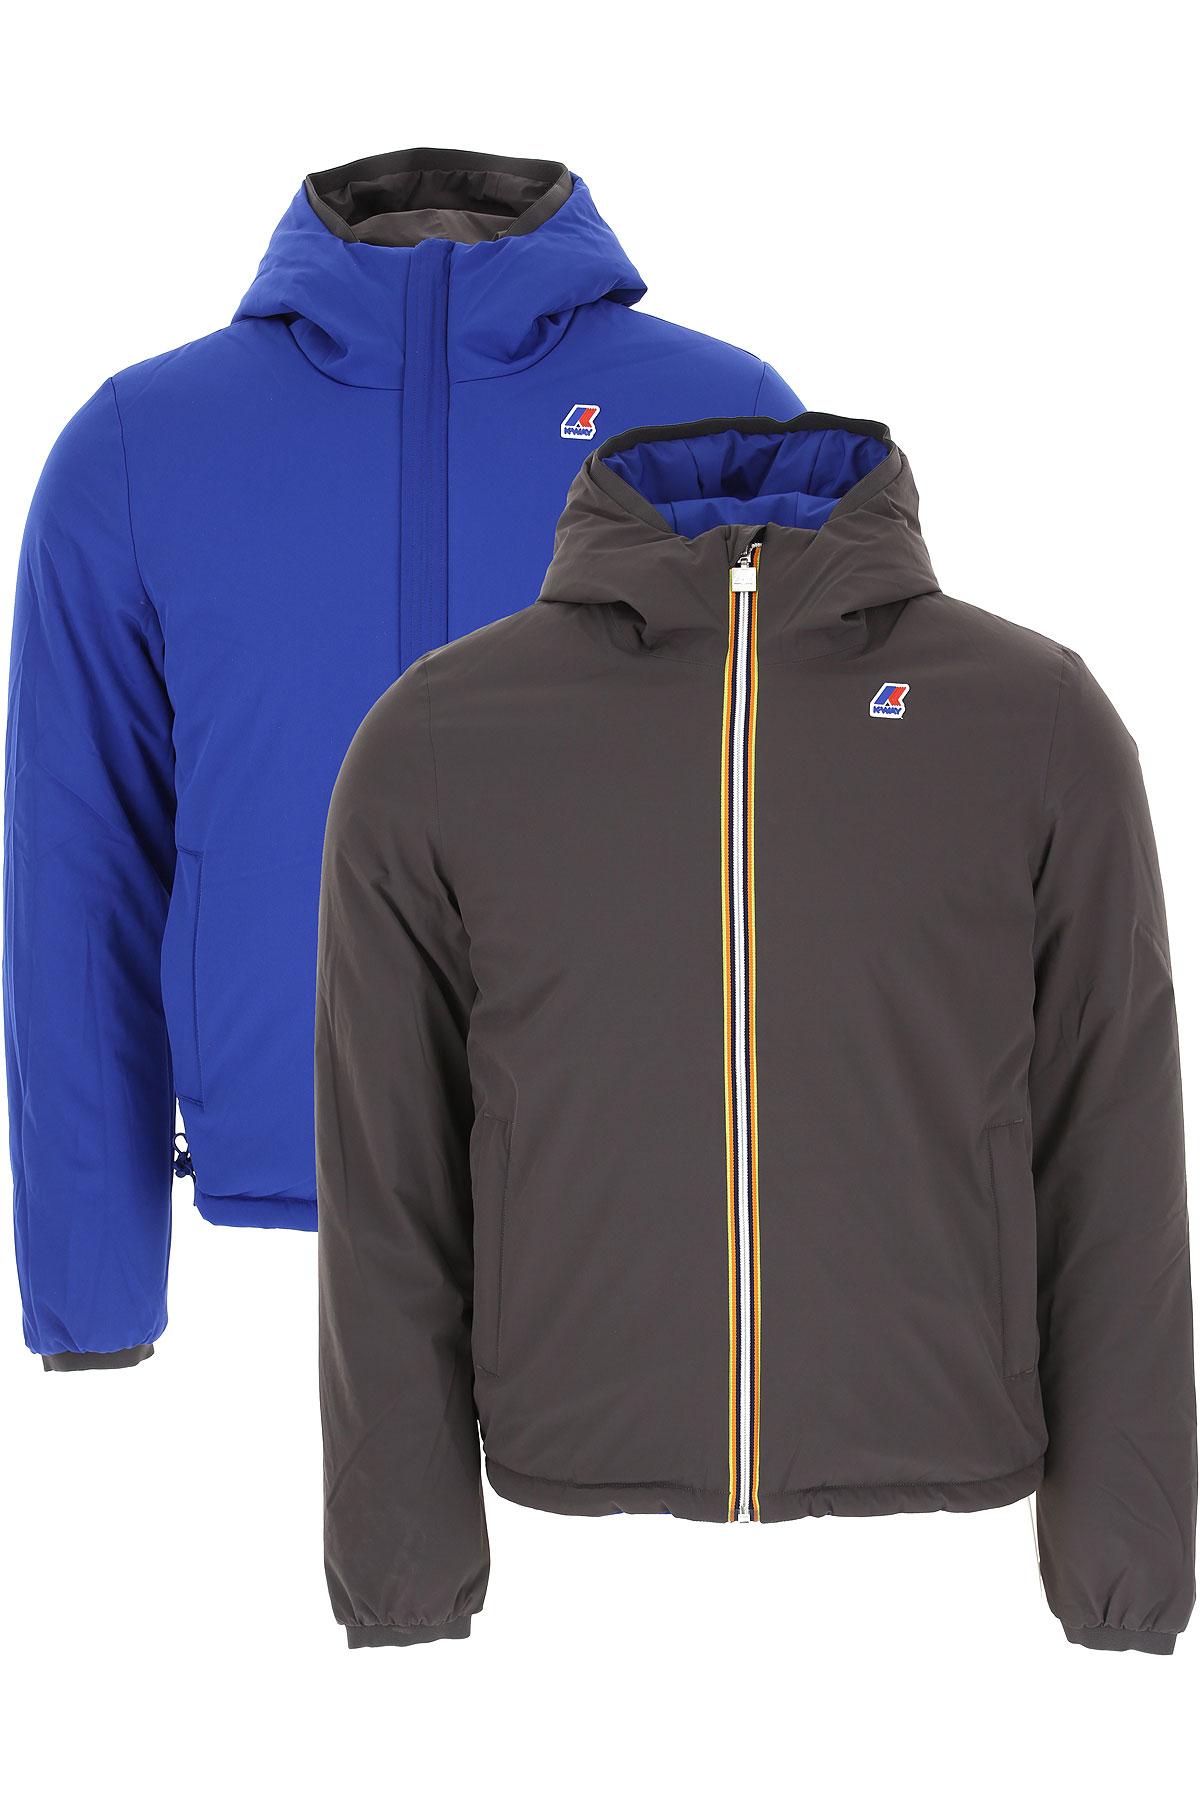 K-Way Down Jacket for Men, Puffer Ski Jacket On Sale, Stone Grey, polyamide, 2019, L M S XXL